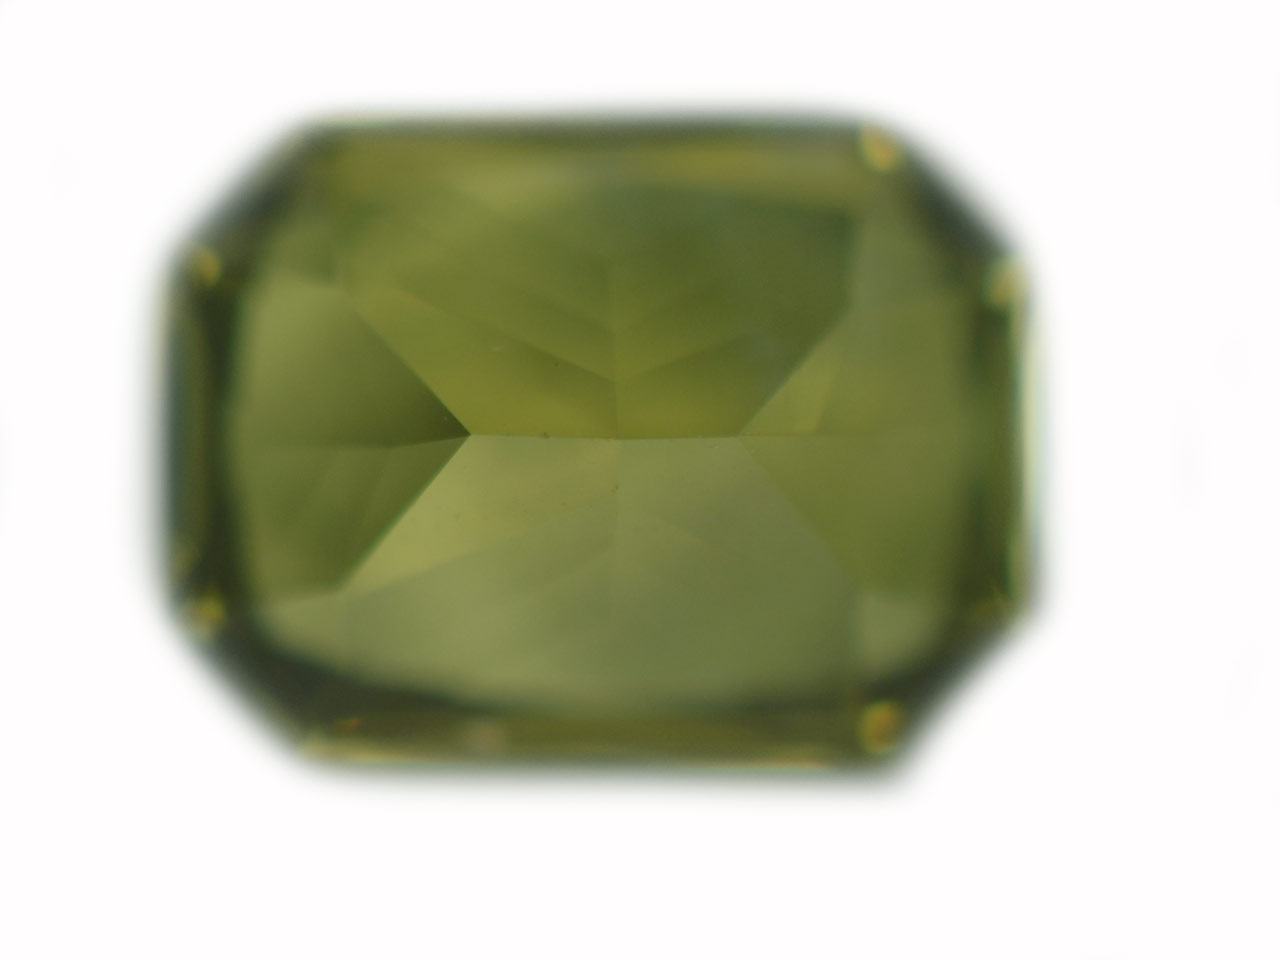 Ceylon Emerald Radiant Cut Chrysoberyl 1.83 carats 8x6x4.2mm